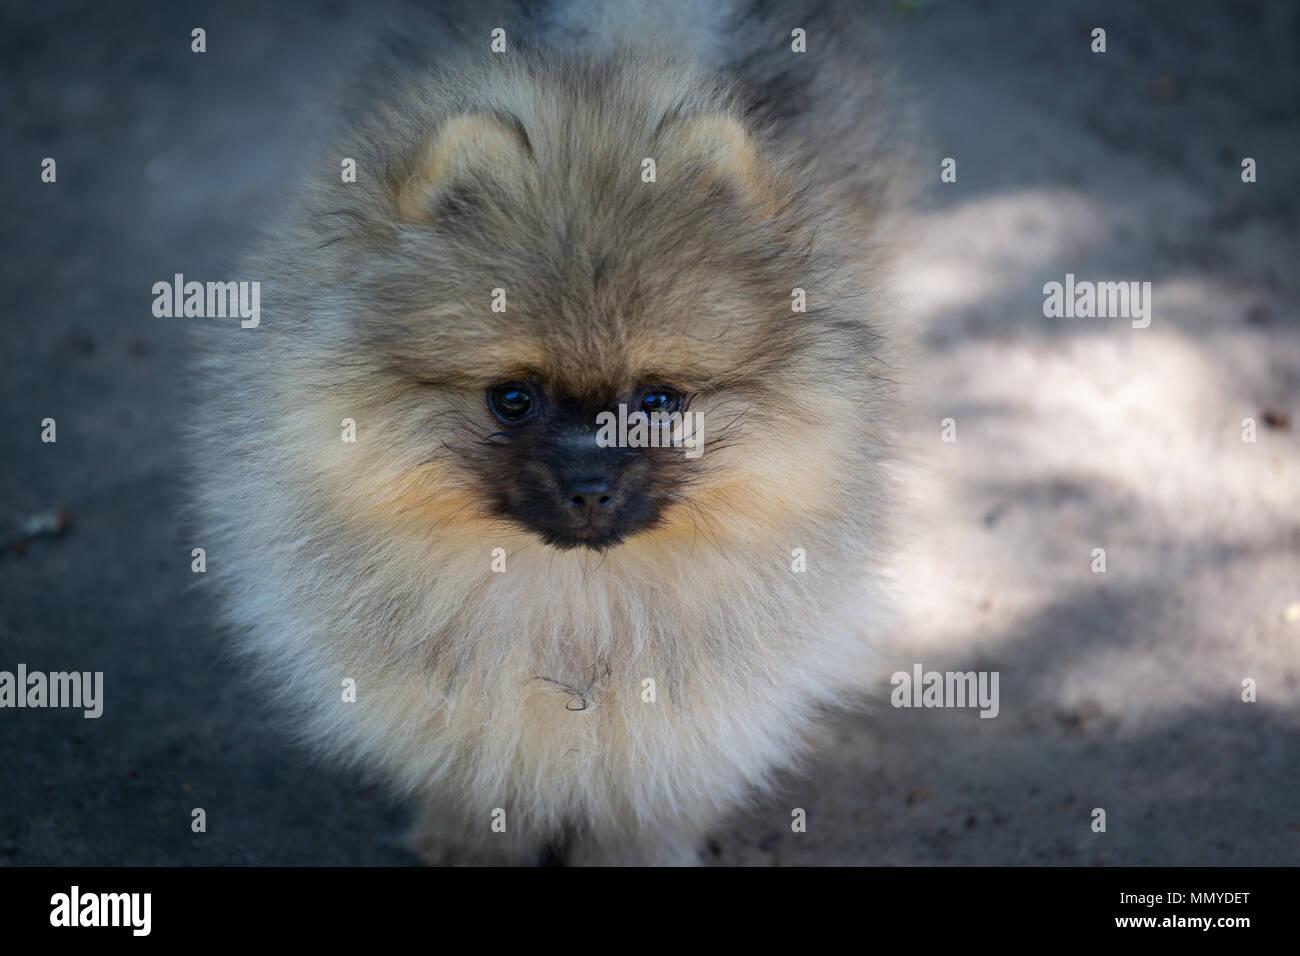 Fluffy White Pomeranian Puppy Stock Photos Fluffy White Pomeranian